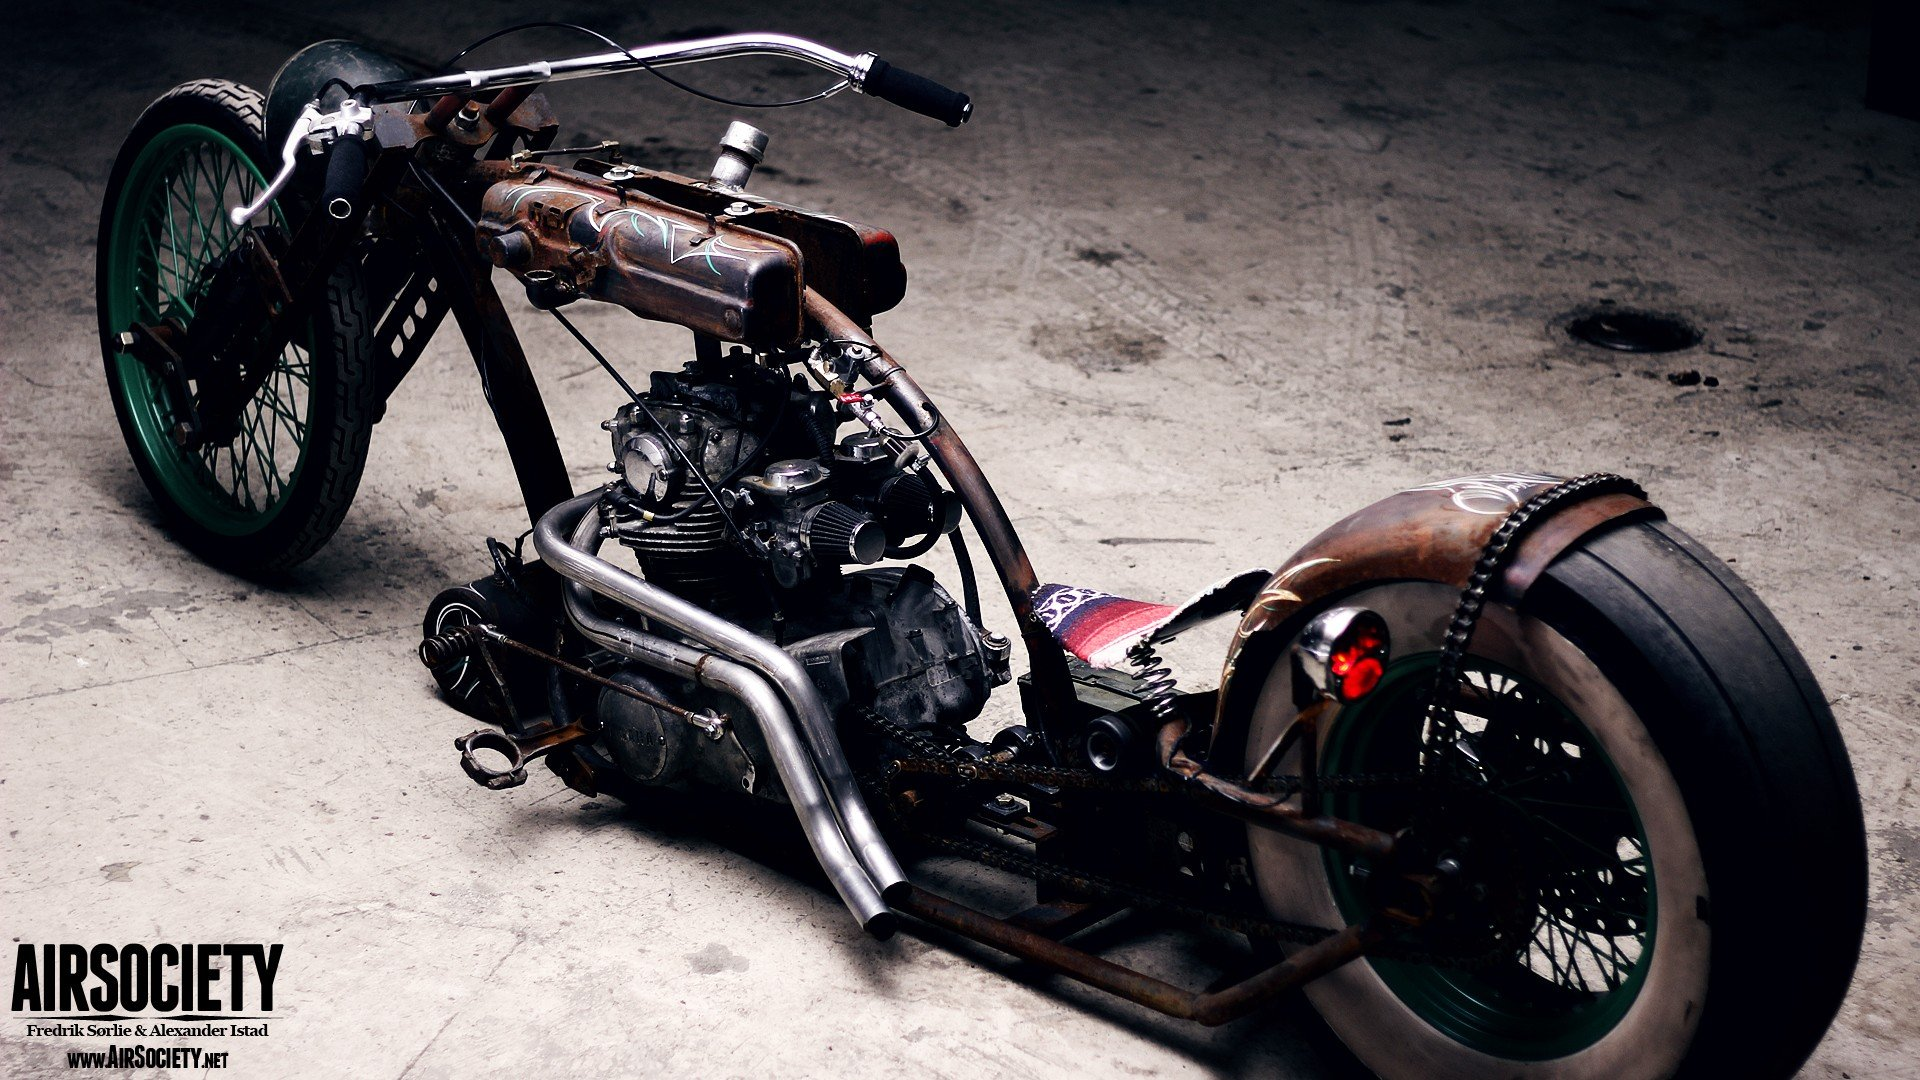 Bike engines chopper ride Yamaha rust suspension motorbikes air 1920x1080